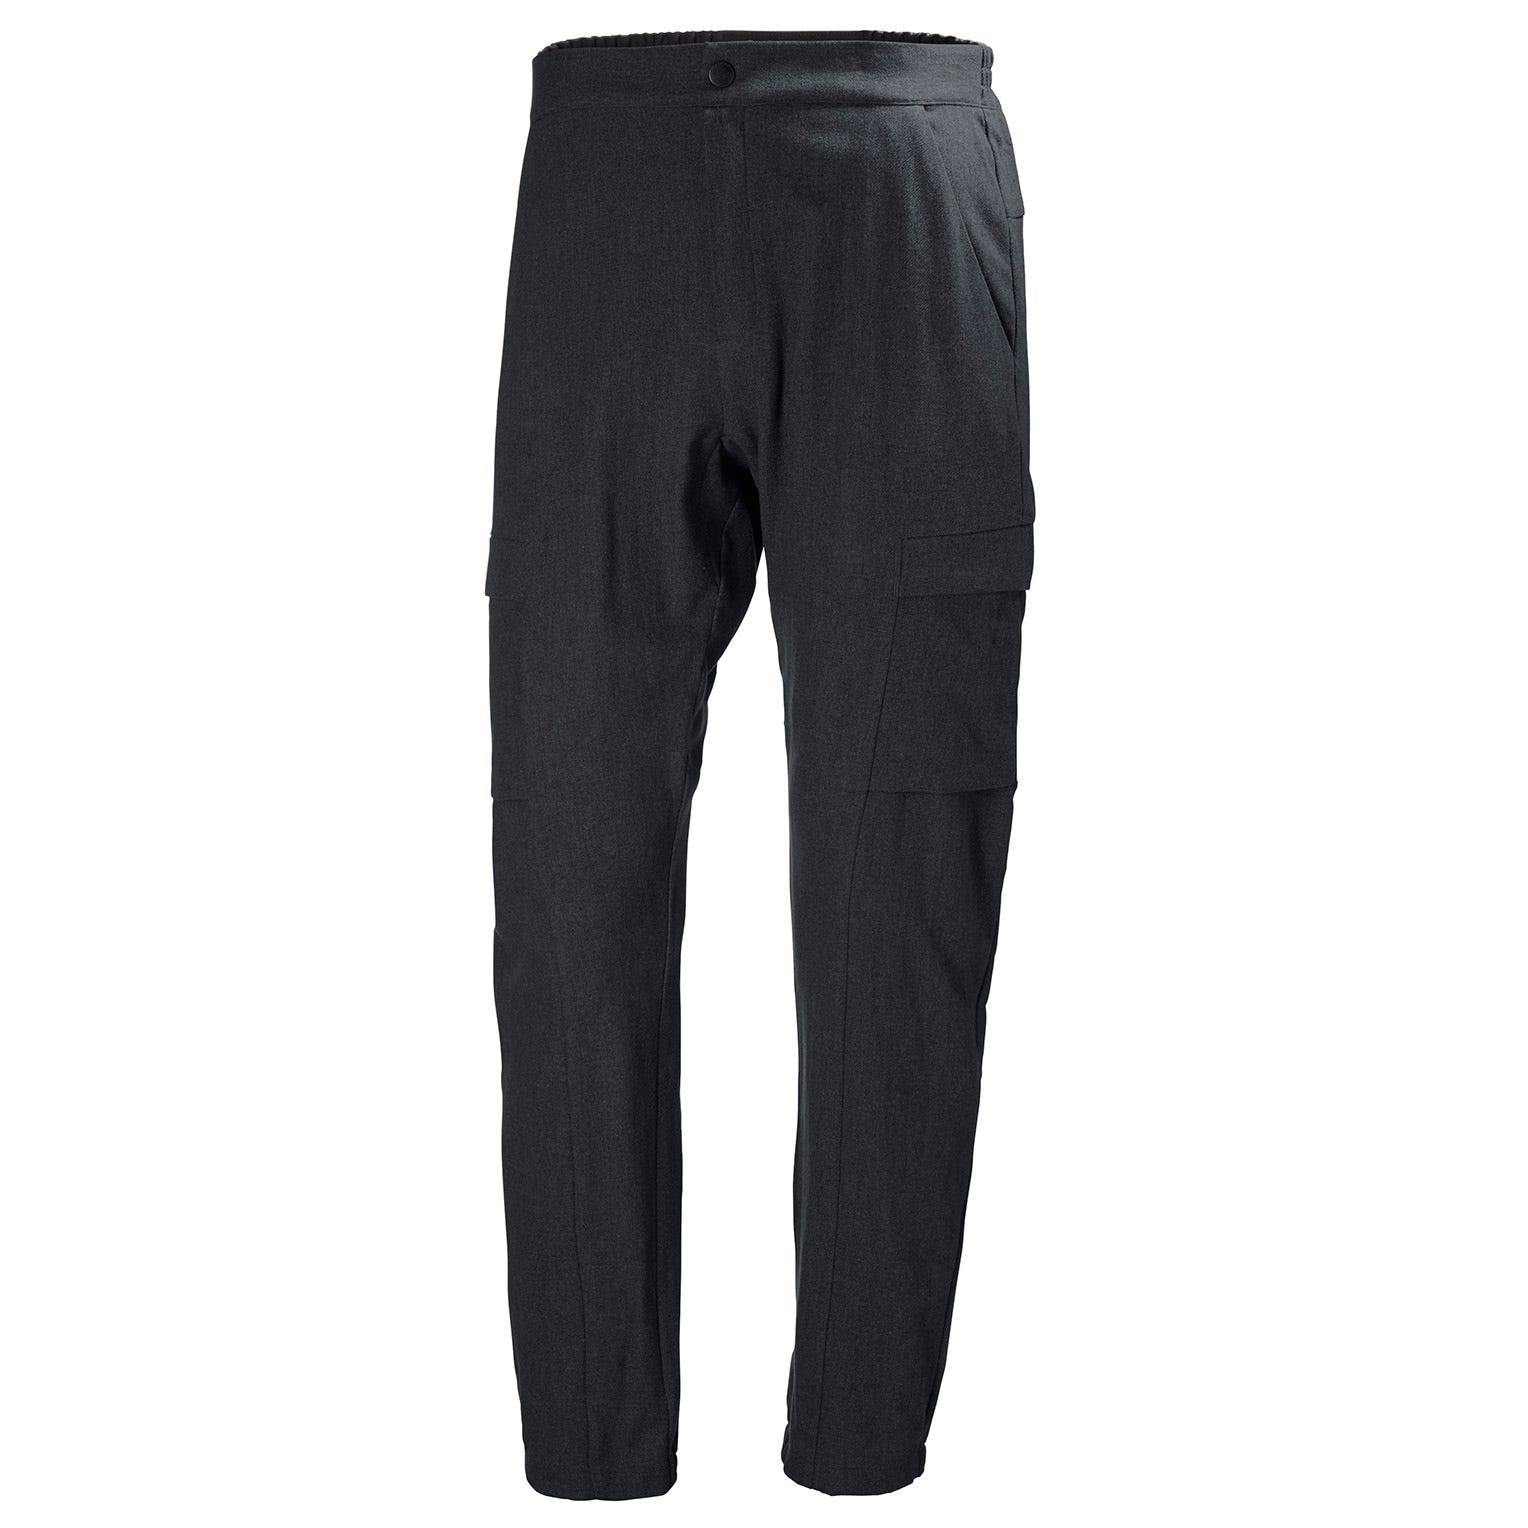 Helly Hansen Wool Travel Hiking Pant Black XXL